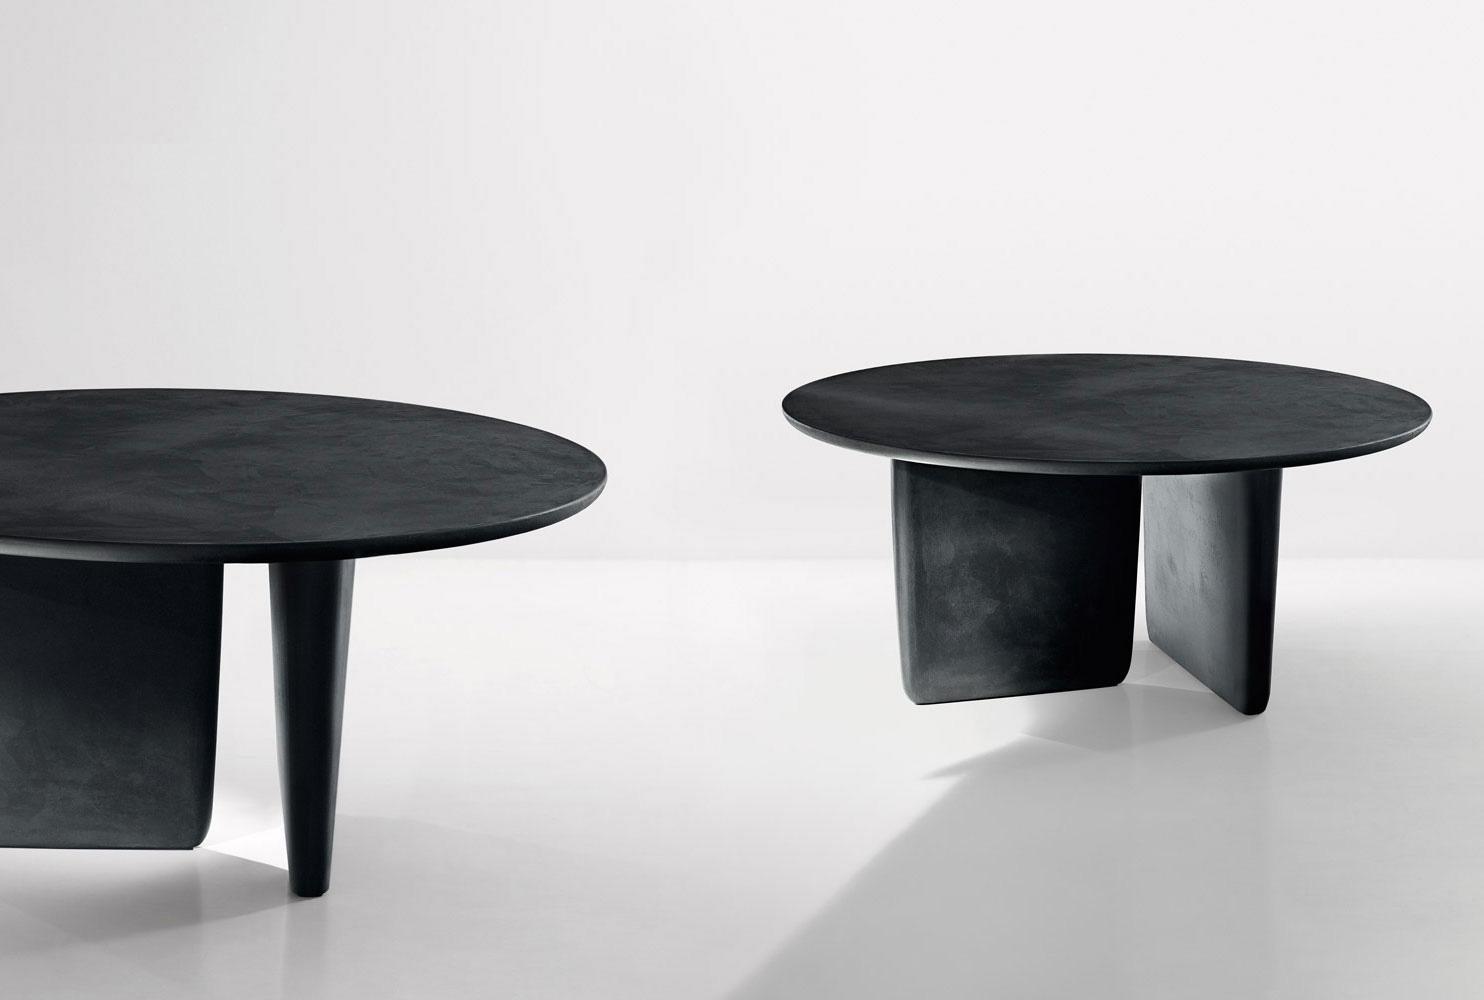 Tobi Ishi Table by Edward Barber And Jay Osgerby B amp B  : tobiIshiTable5 from www.wood-furniture.biz size 1484 x 1000 jpeg 86kB